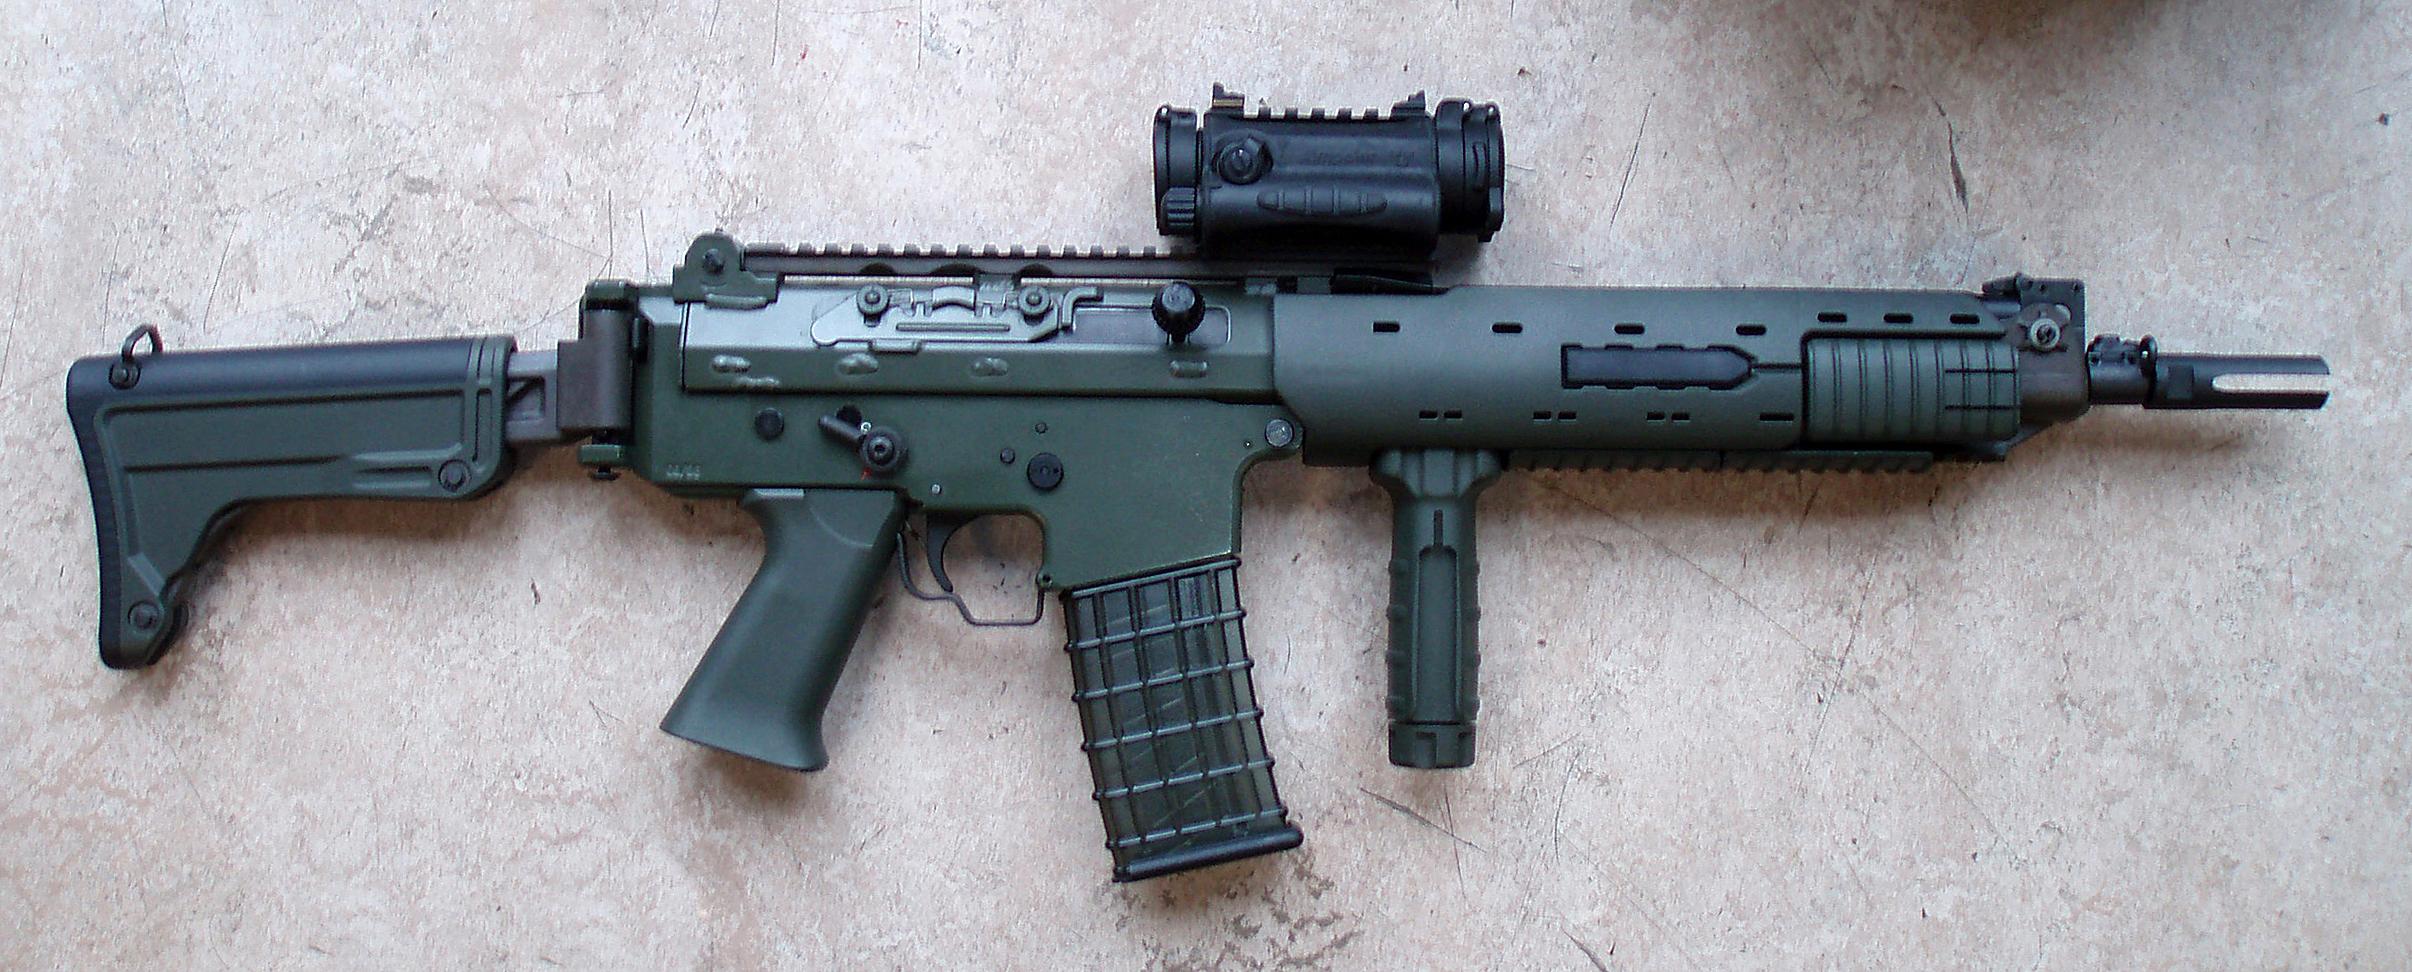 The Assault Rifles Of The Near Future   21st Century Asian